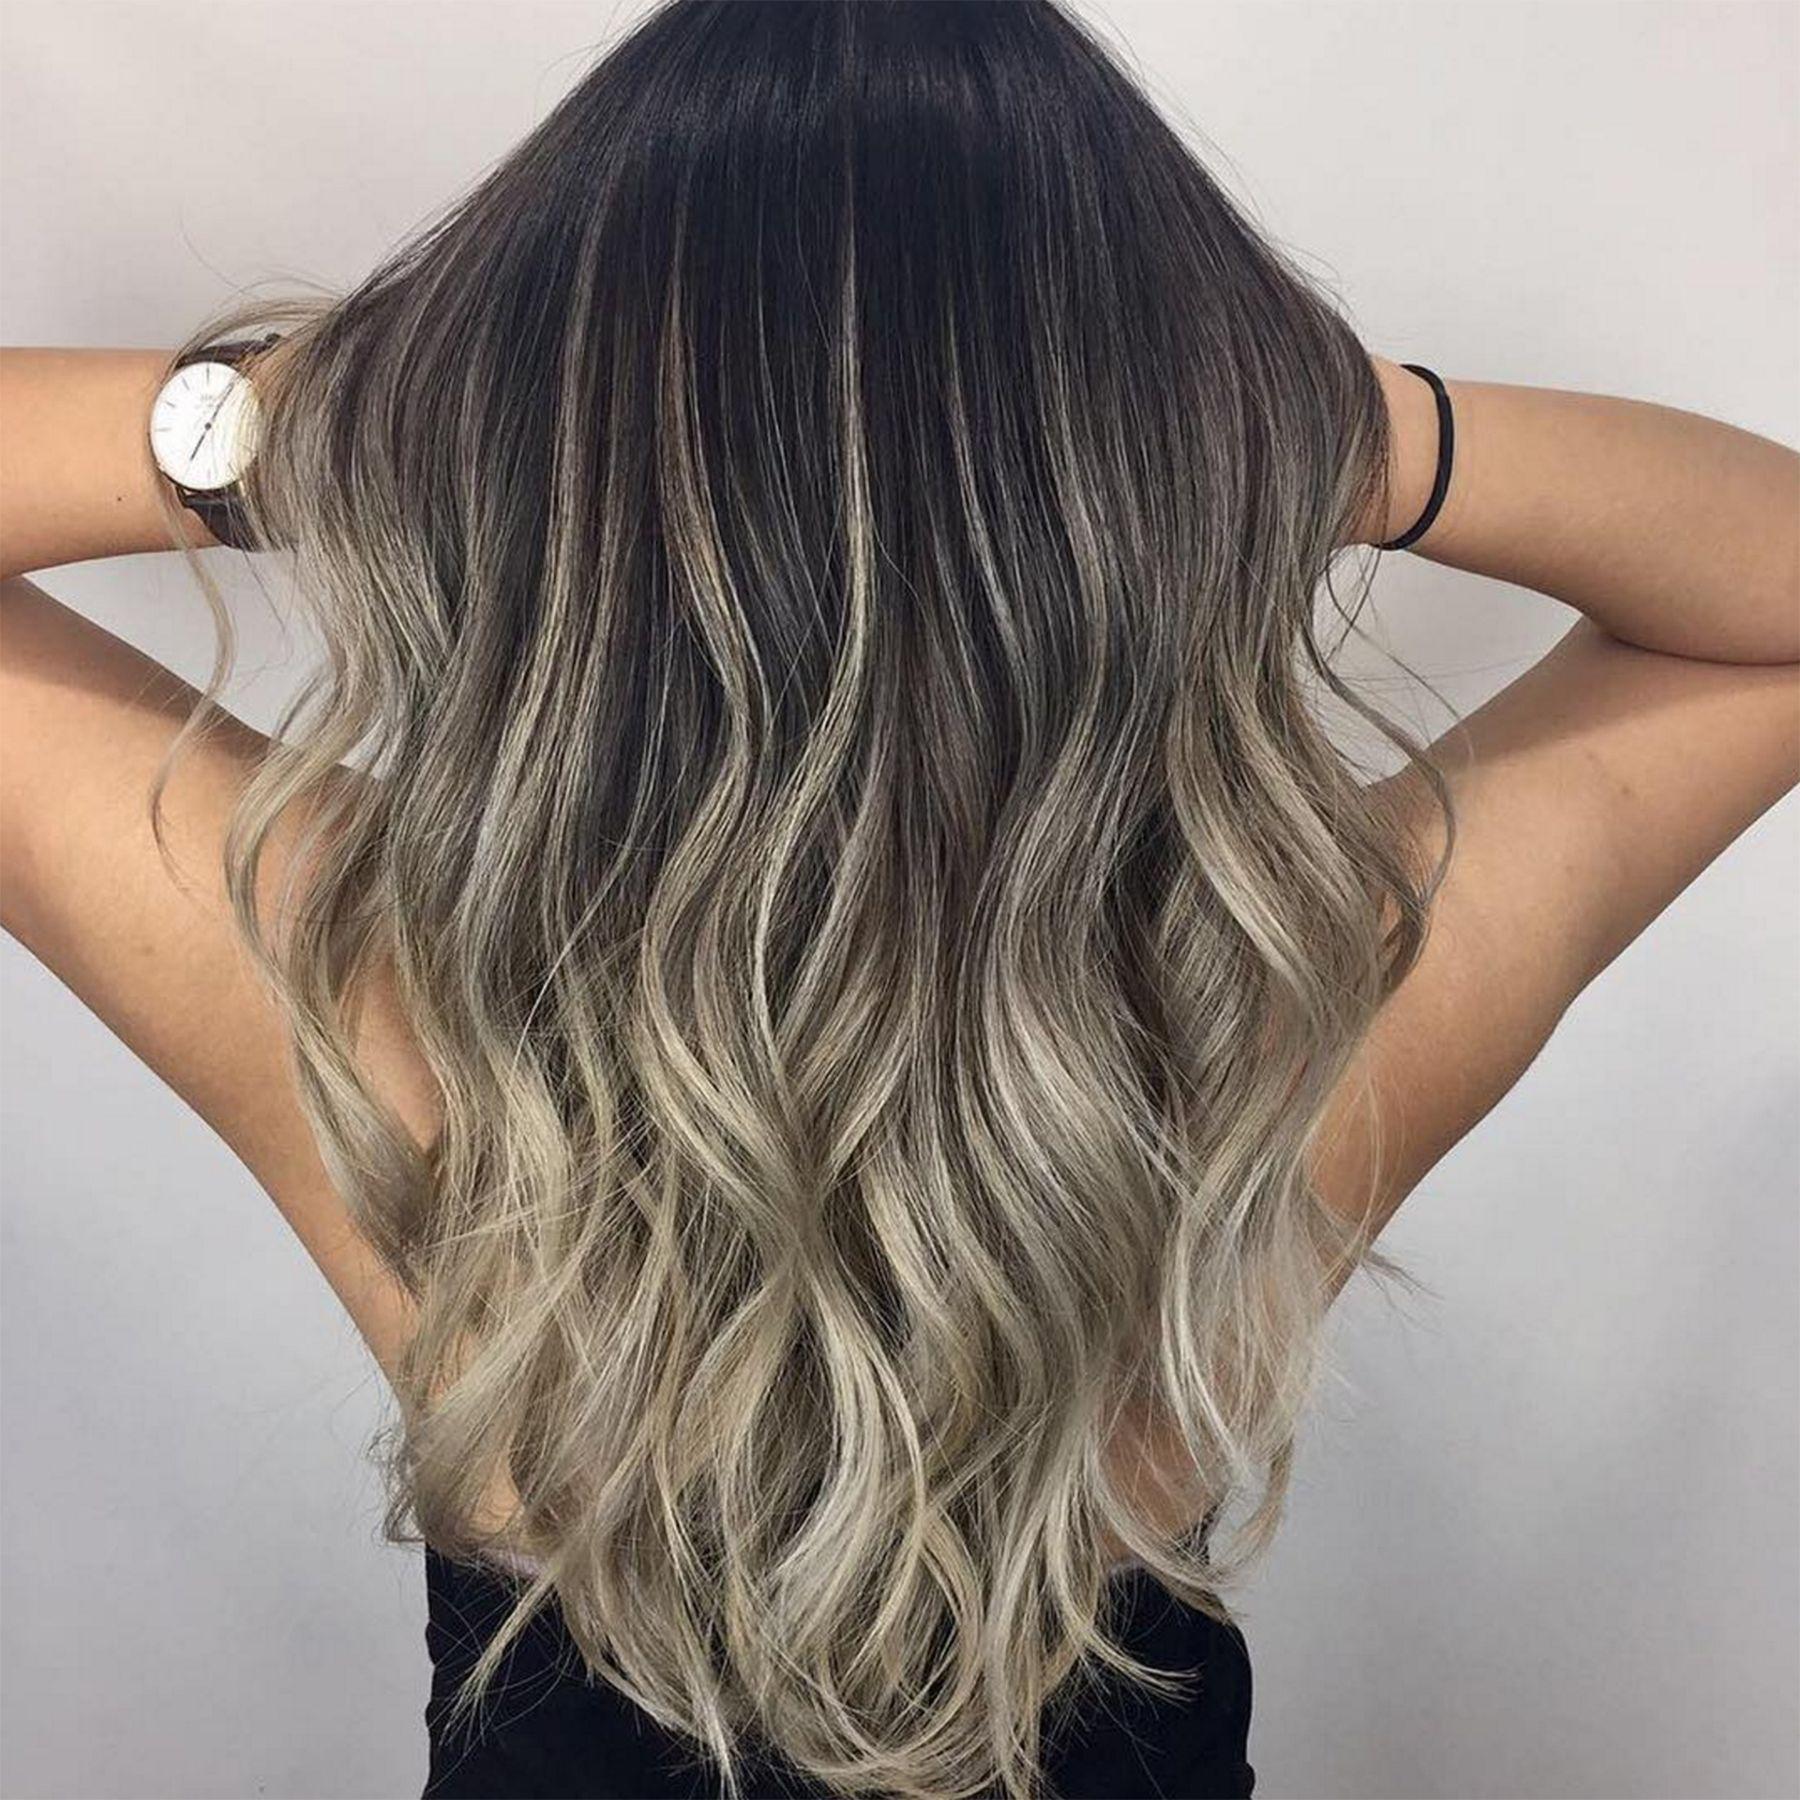 Ash Balayage Inspiration From Pictures To Products Glamour Uk Ash Blonde Hair Balayage Balayage Hair Ash Balayage